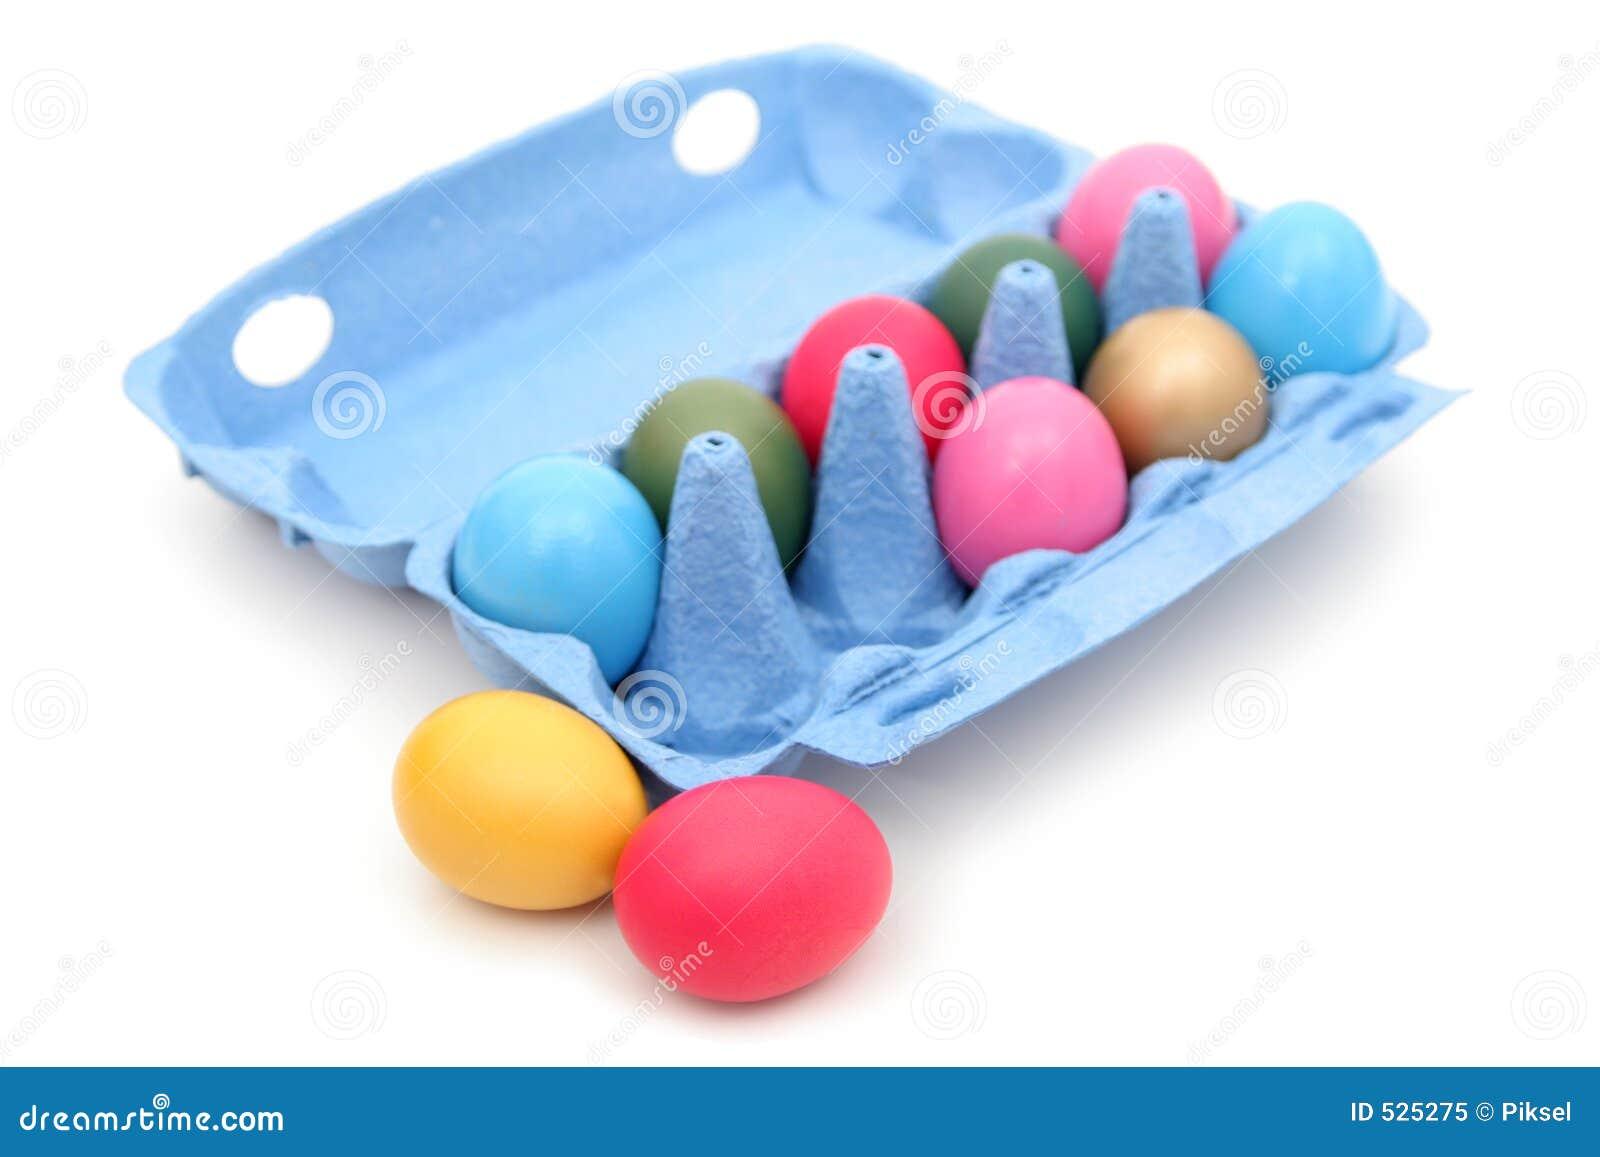 Download 复活节彩蛋 库存图片. 图片 包括有 传统, 特殊, 图标, 的协助, 脆弱, 五颜六色, 蛋壳, 黄色, 场合 - 525275